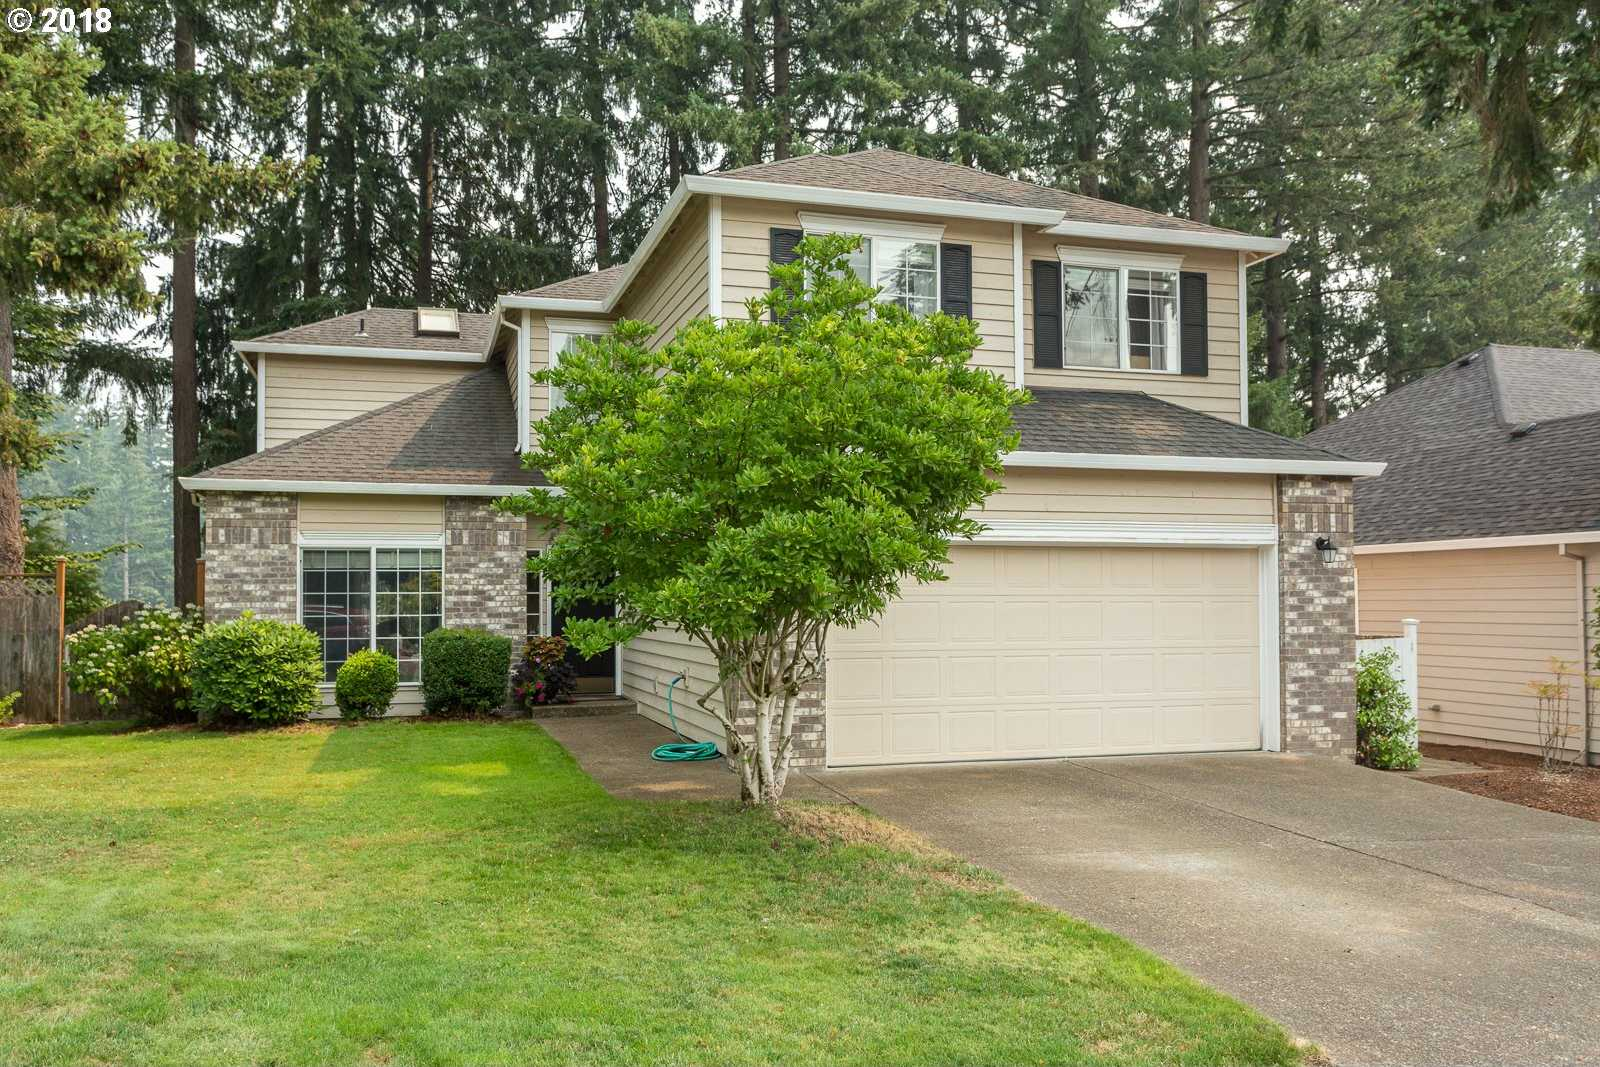 $489,950 - 4Br/3Ba -  for Sale in Murrayhill Area, Beaverton